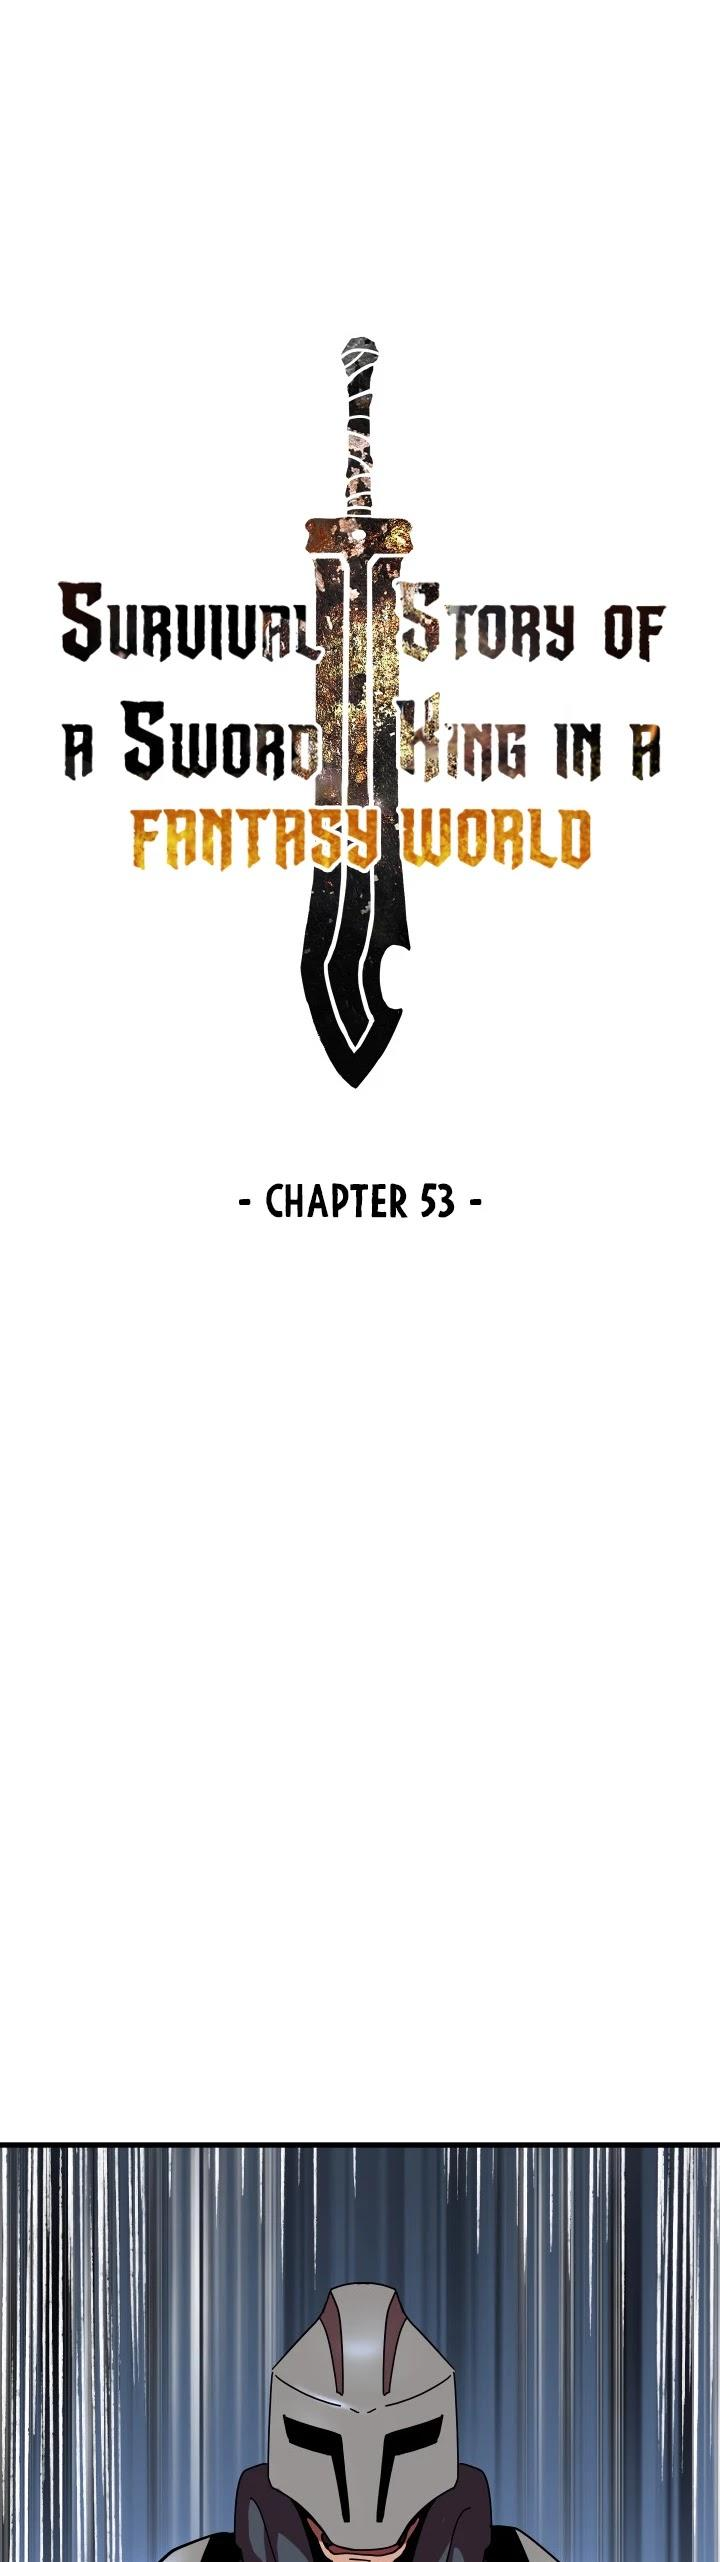 Survival Story Of A Sword King In A Fantasy World Chapter 53 page 20 - Mangakakalots.com